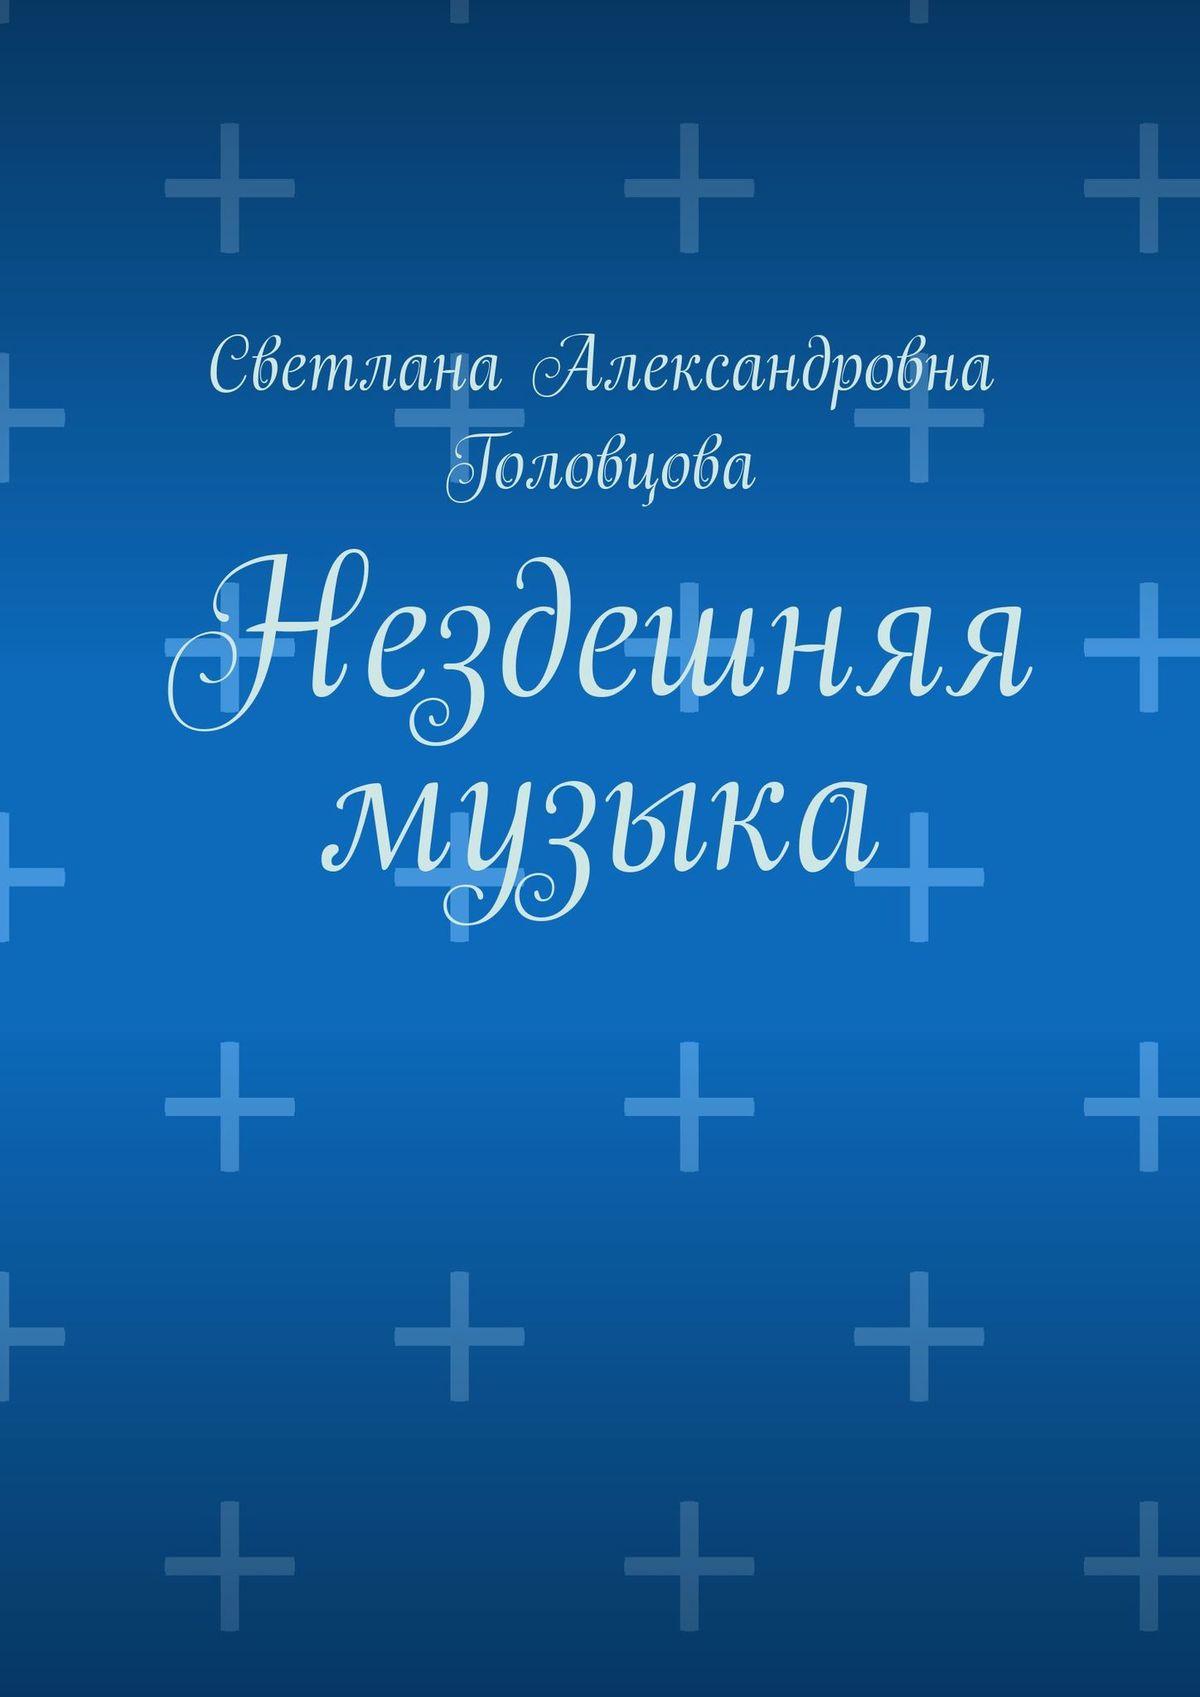 Светлана Александровна Головцова Нездешняя музыка светлана чайка стихи о…